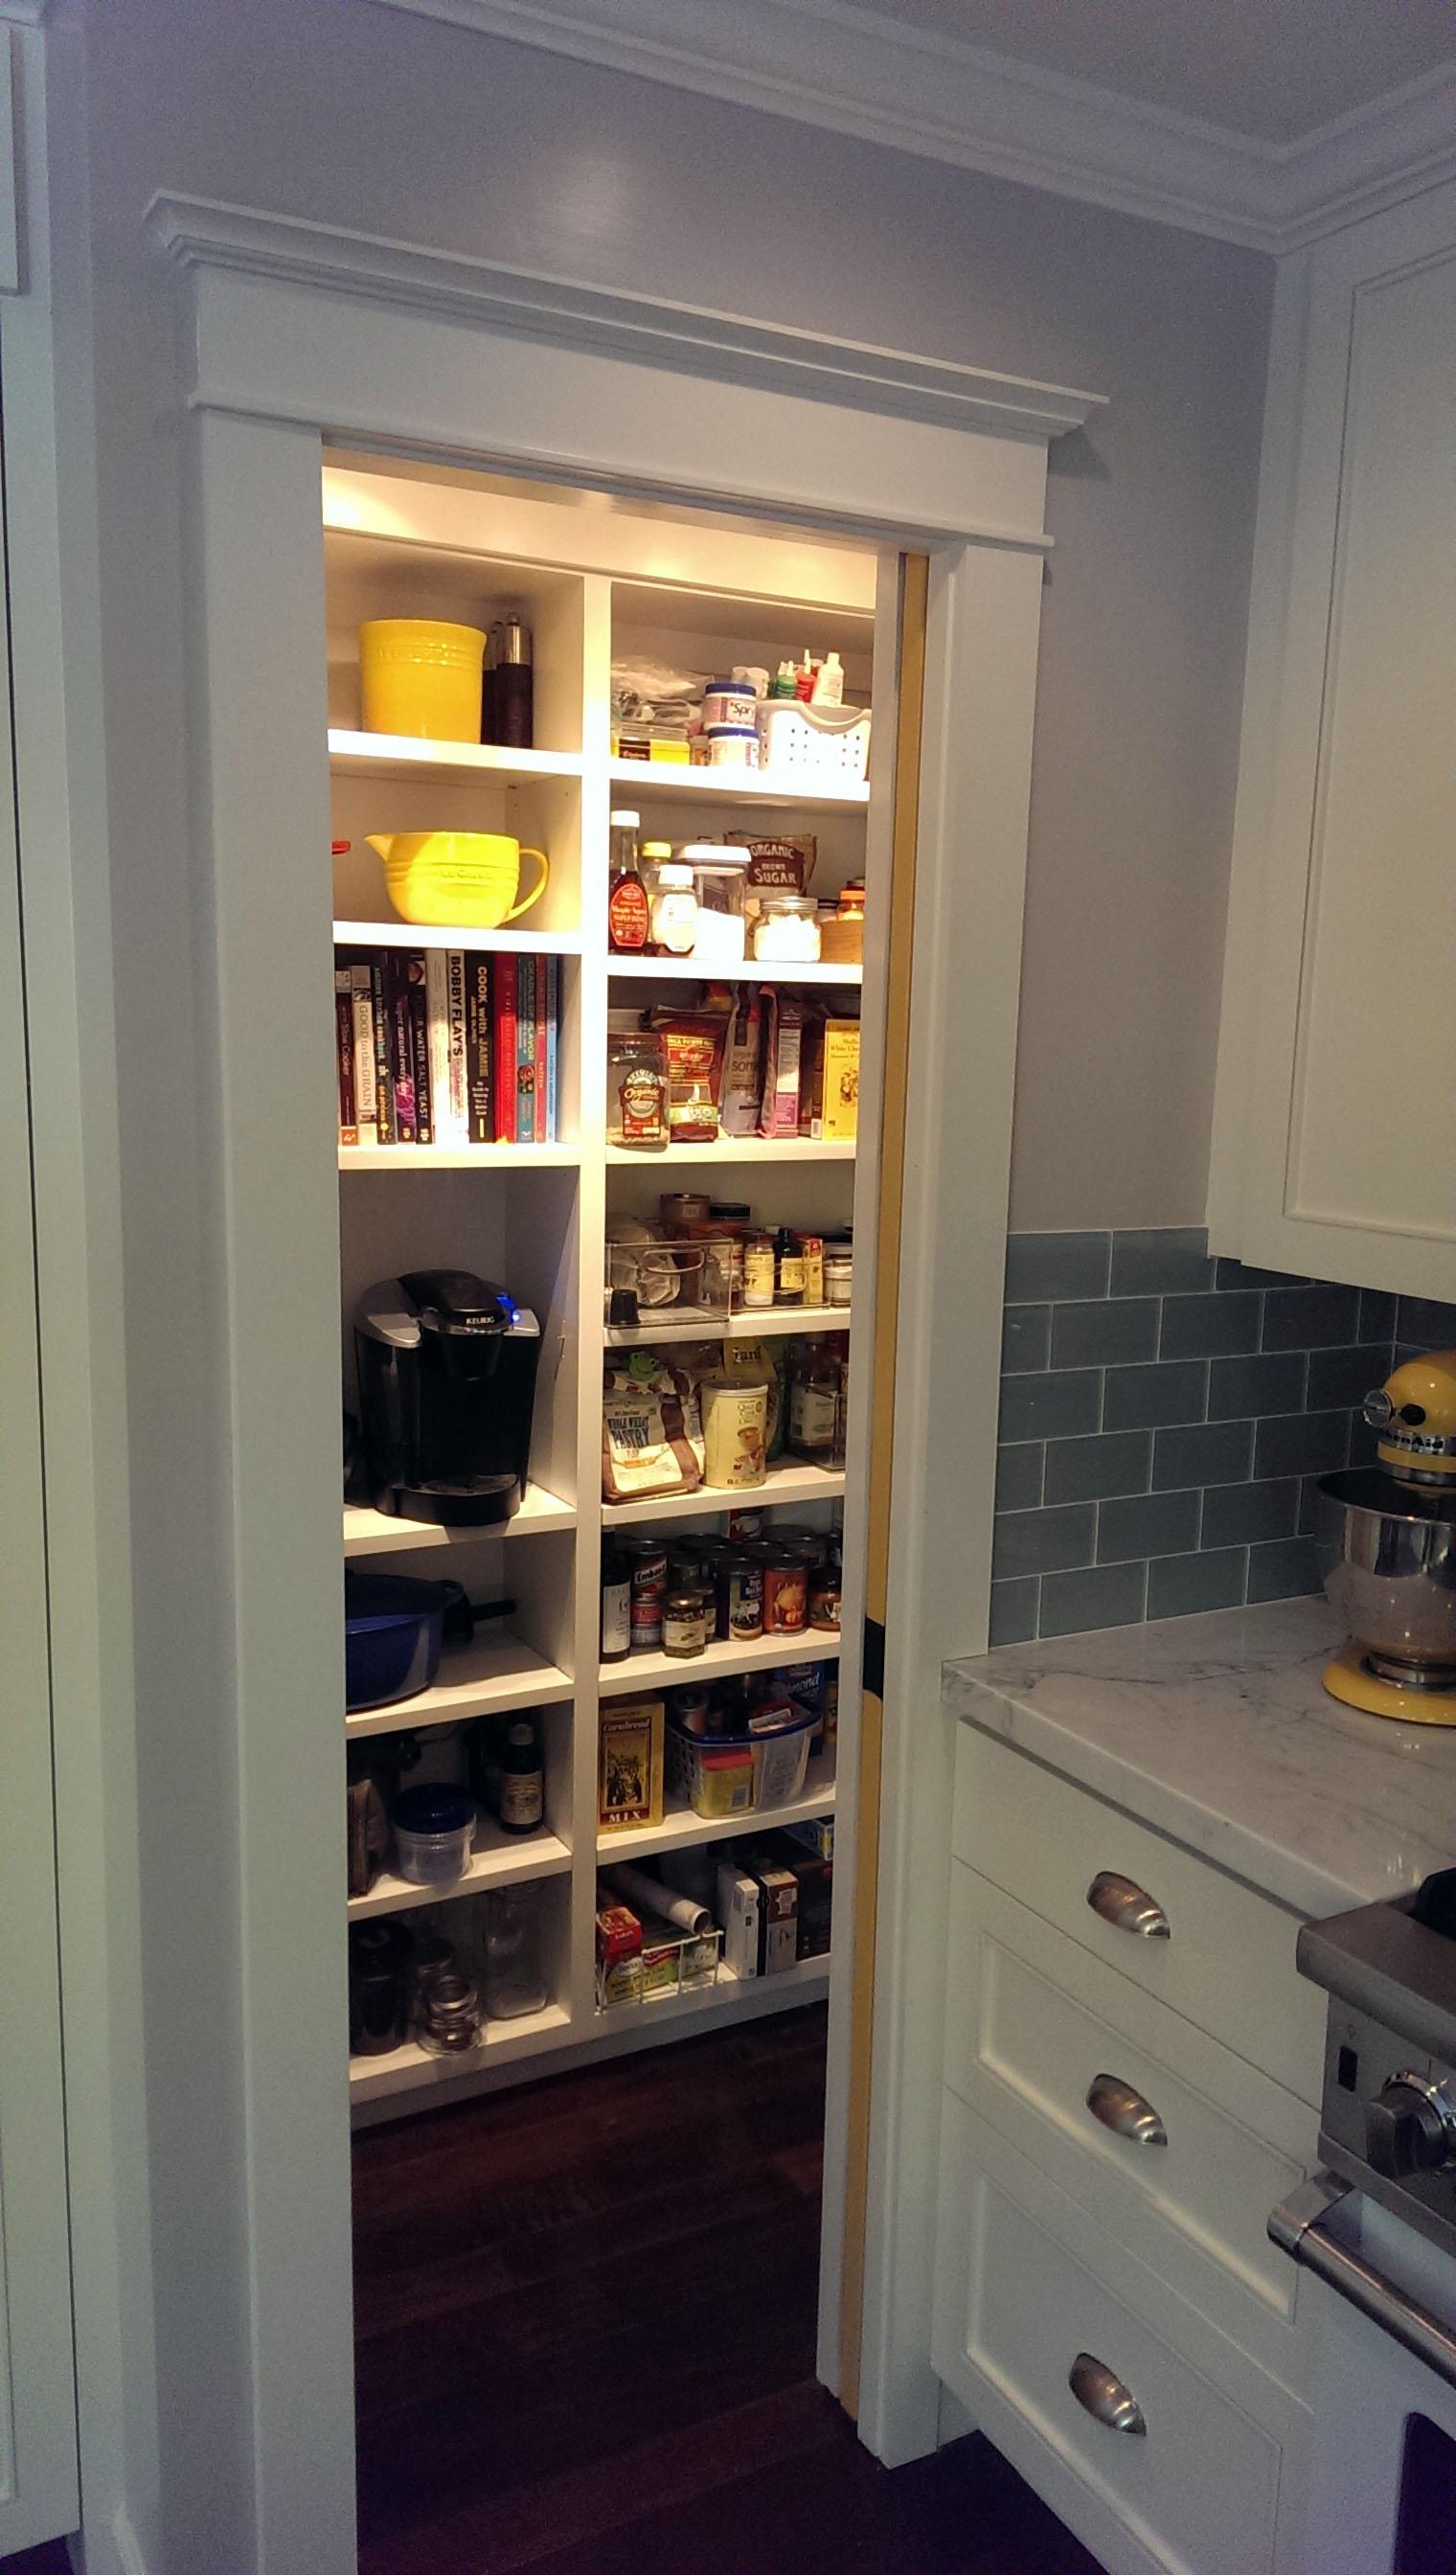 Kitchen - Pantry